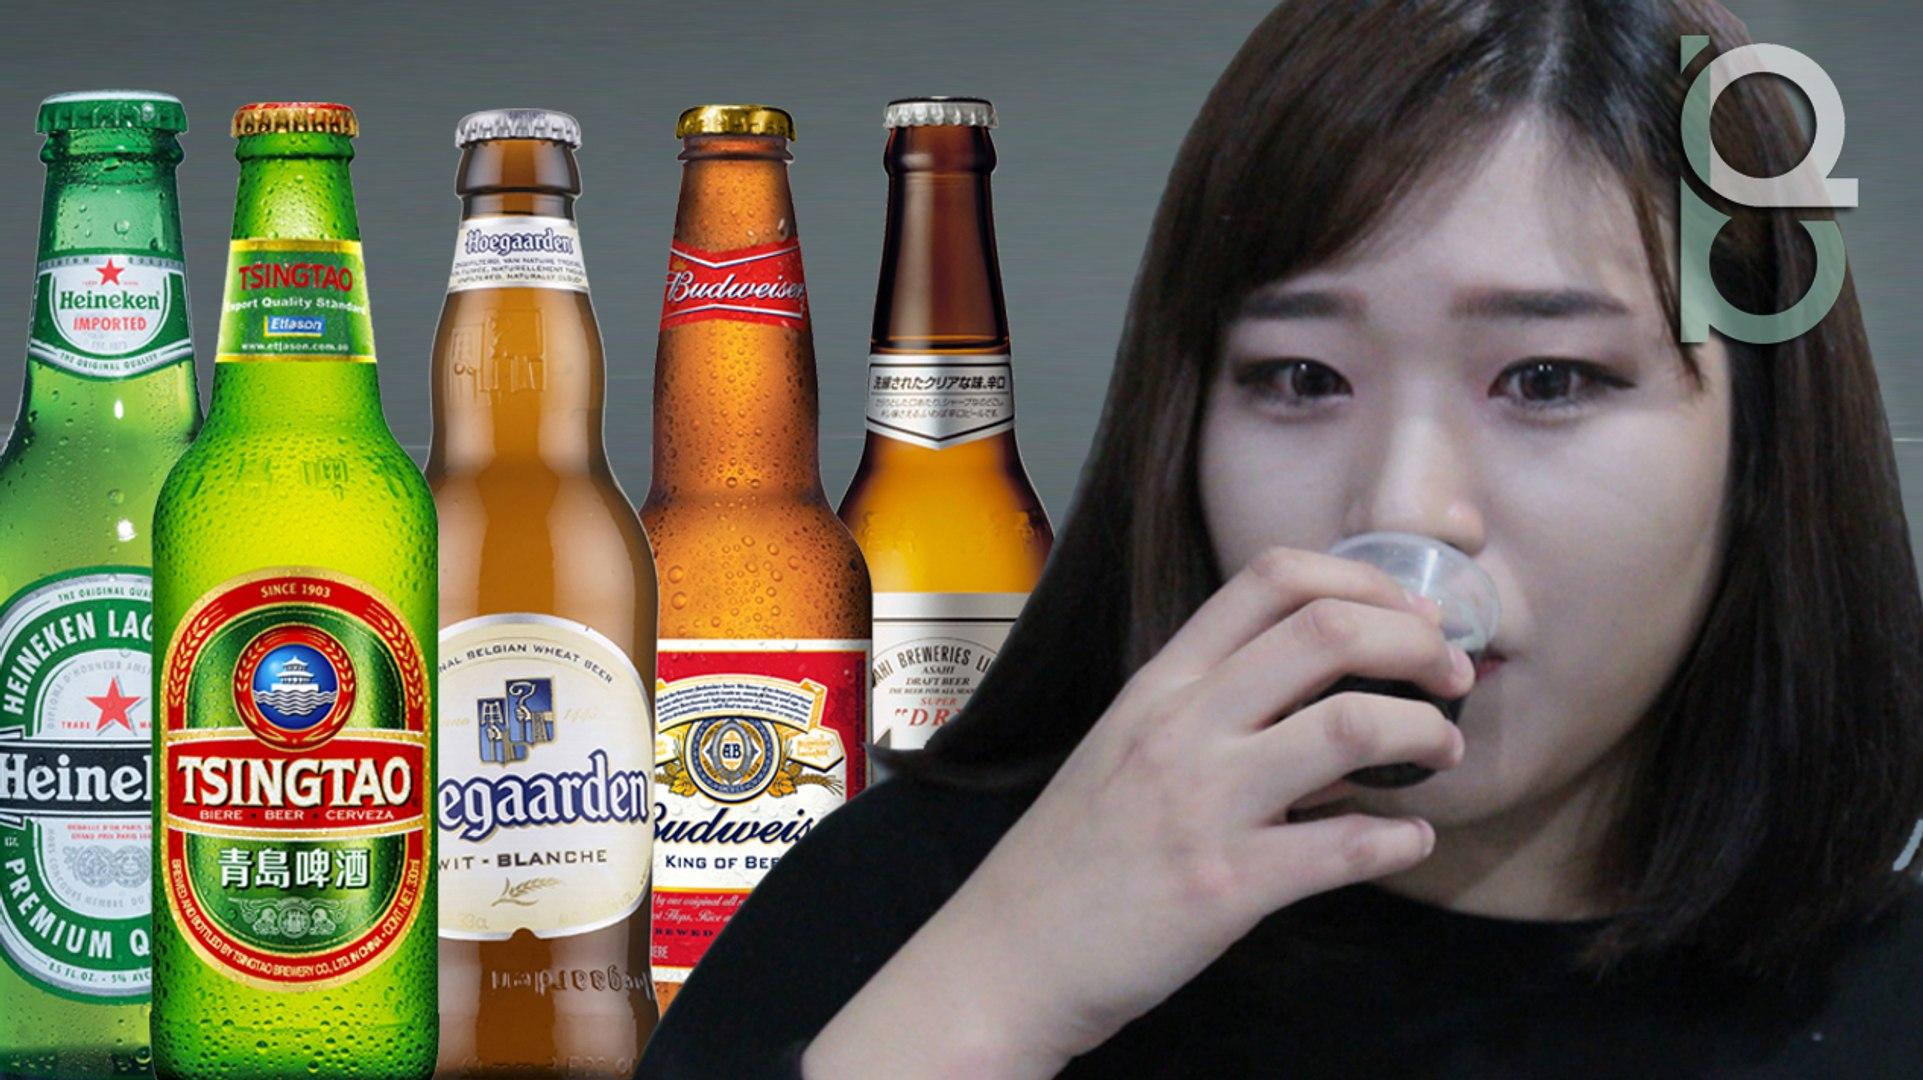 Korean girls Try Popular Beer From Around The World